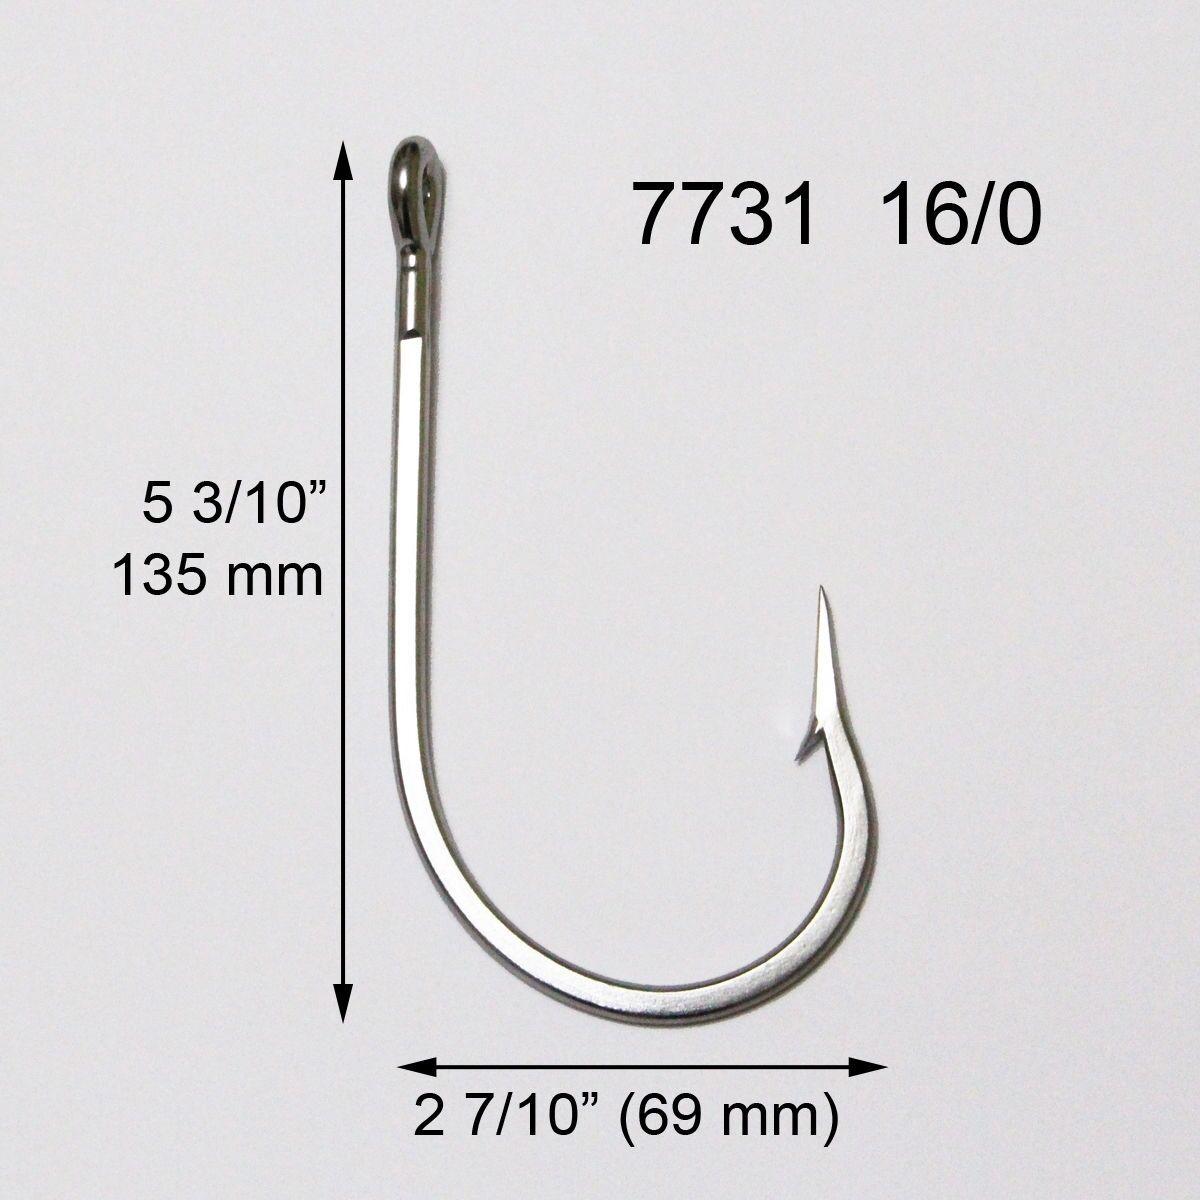 20 Pcs 7731 16 0 Stainless Steel Big Game  Fishing Hook Tuna Shark Marlin Dorado  unique shape